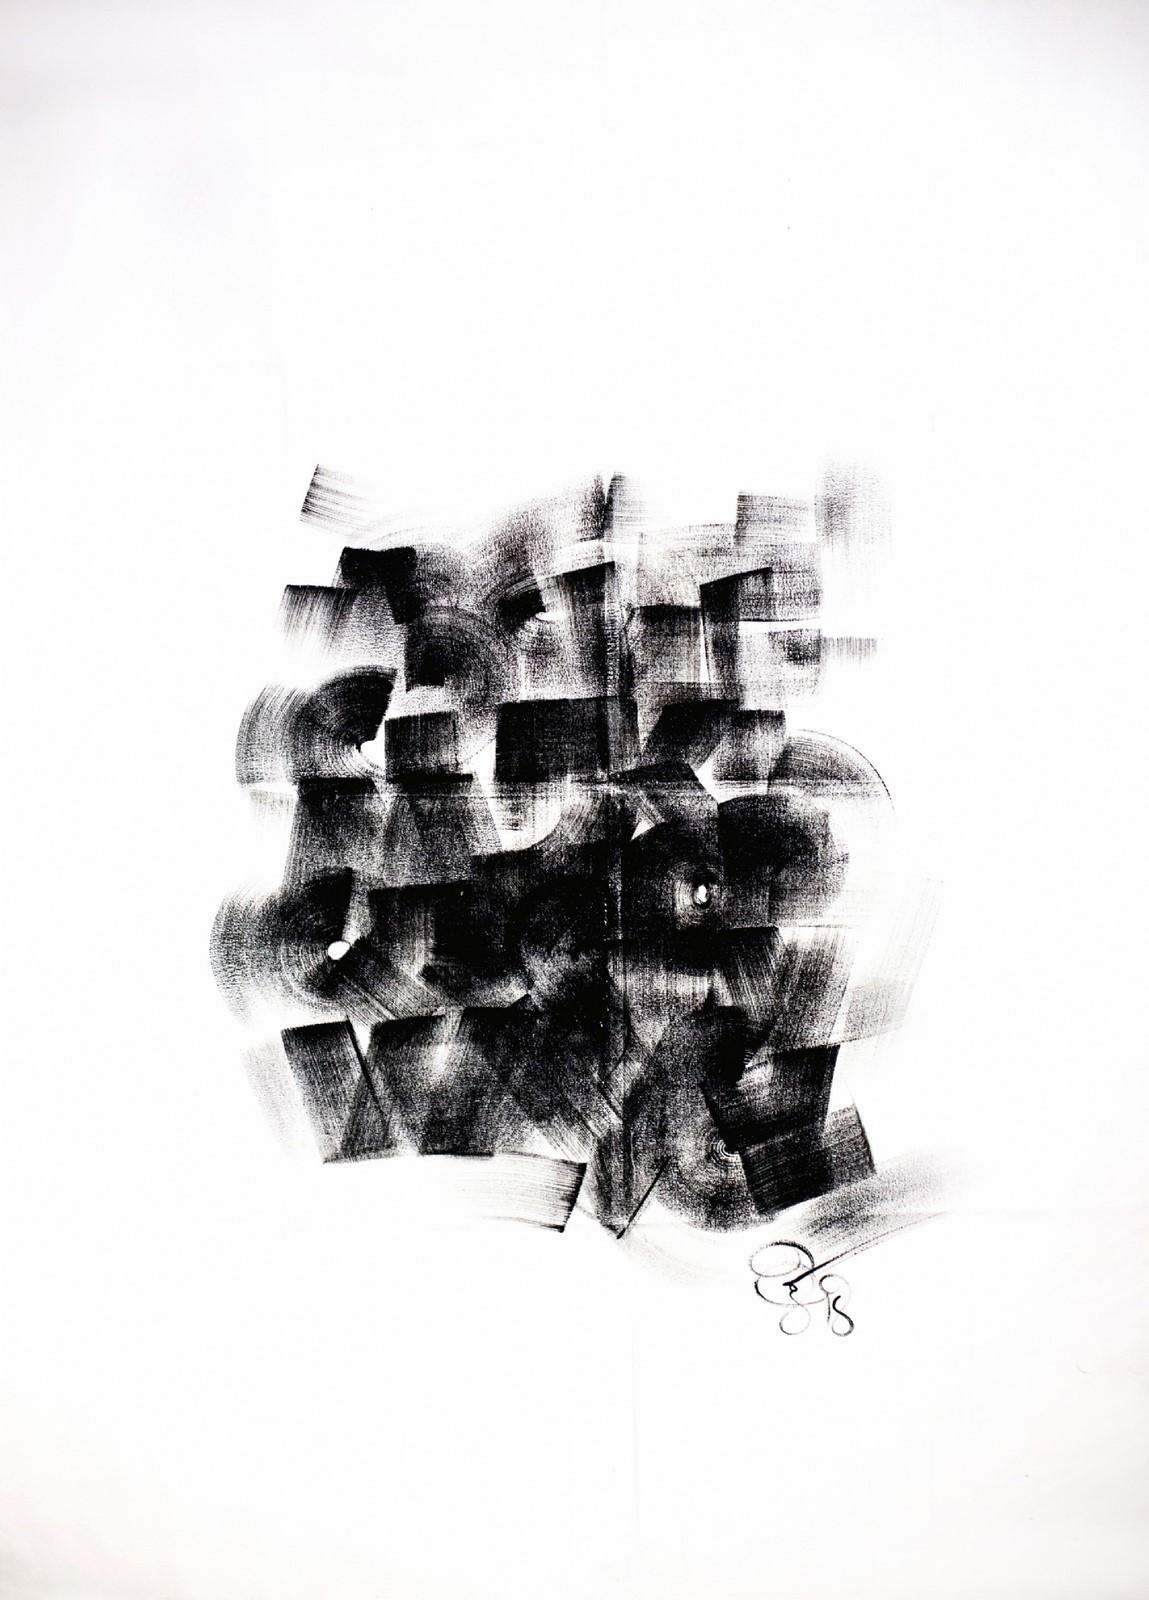 "<p>""Bruta Alfabe Bloğu: Santa Cruz de la Sierr""a, Bolivya, Tuval üzerine yağlıboya, 200 x 240 cm, 2018.<br /><em>""Bruta Alphabet Block"", Painted in Santa Cruz de la Sierra, Bolivia, Oil on canvas, Dimensions: 200 x 240 cm, 2018.</em></p><p></p>"